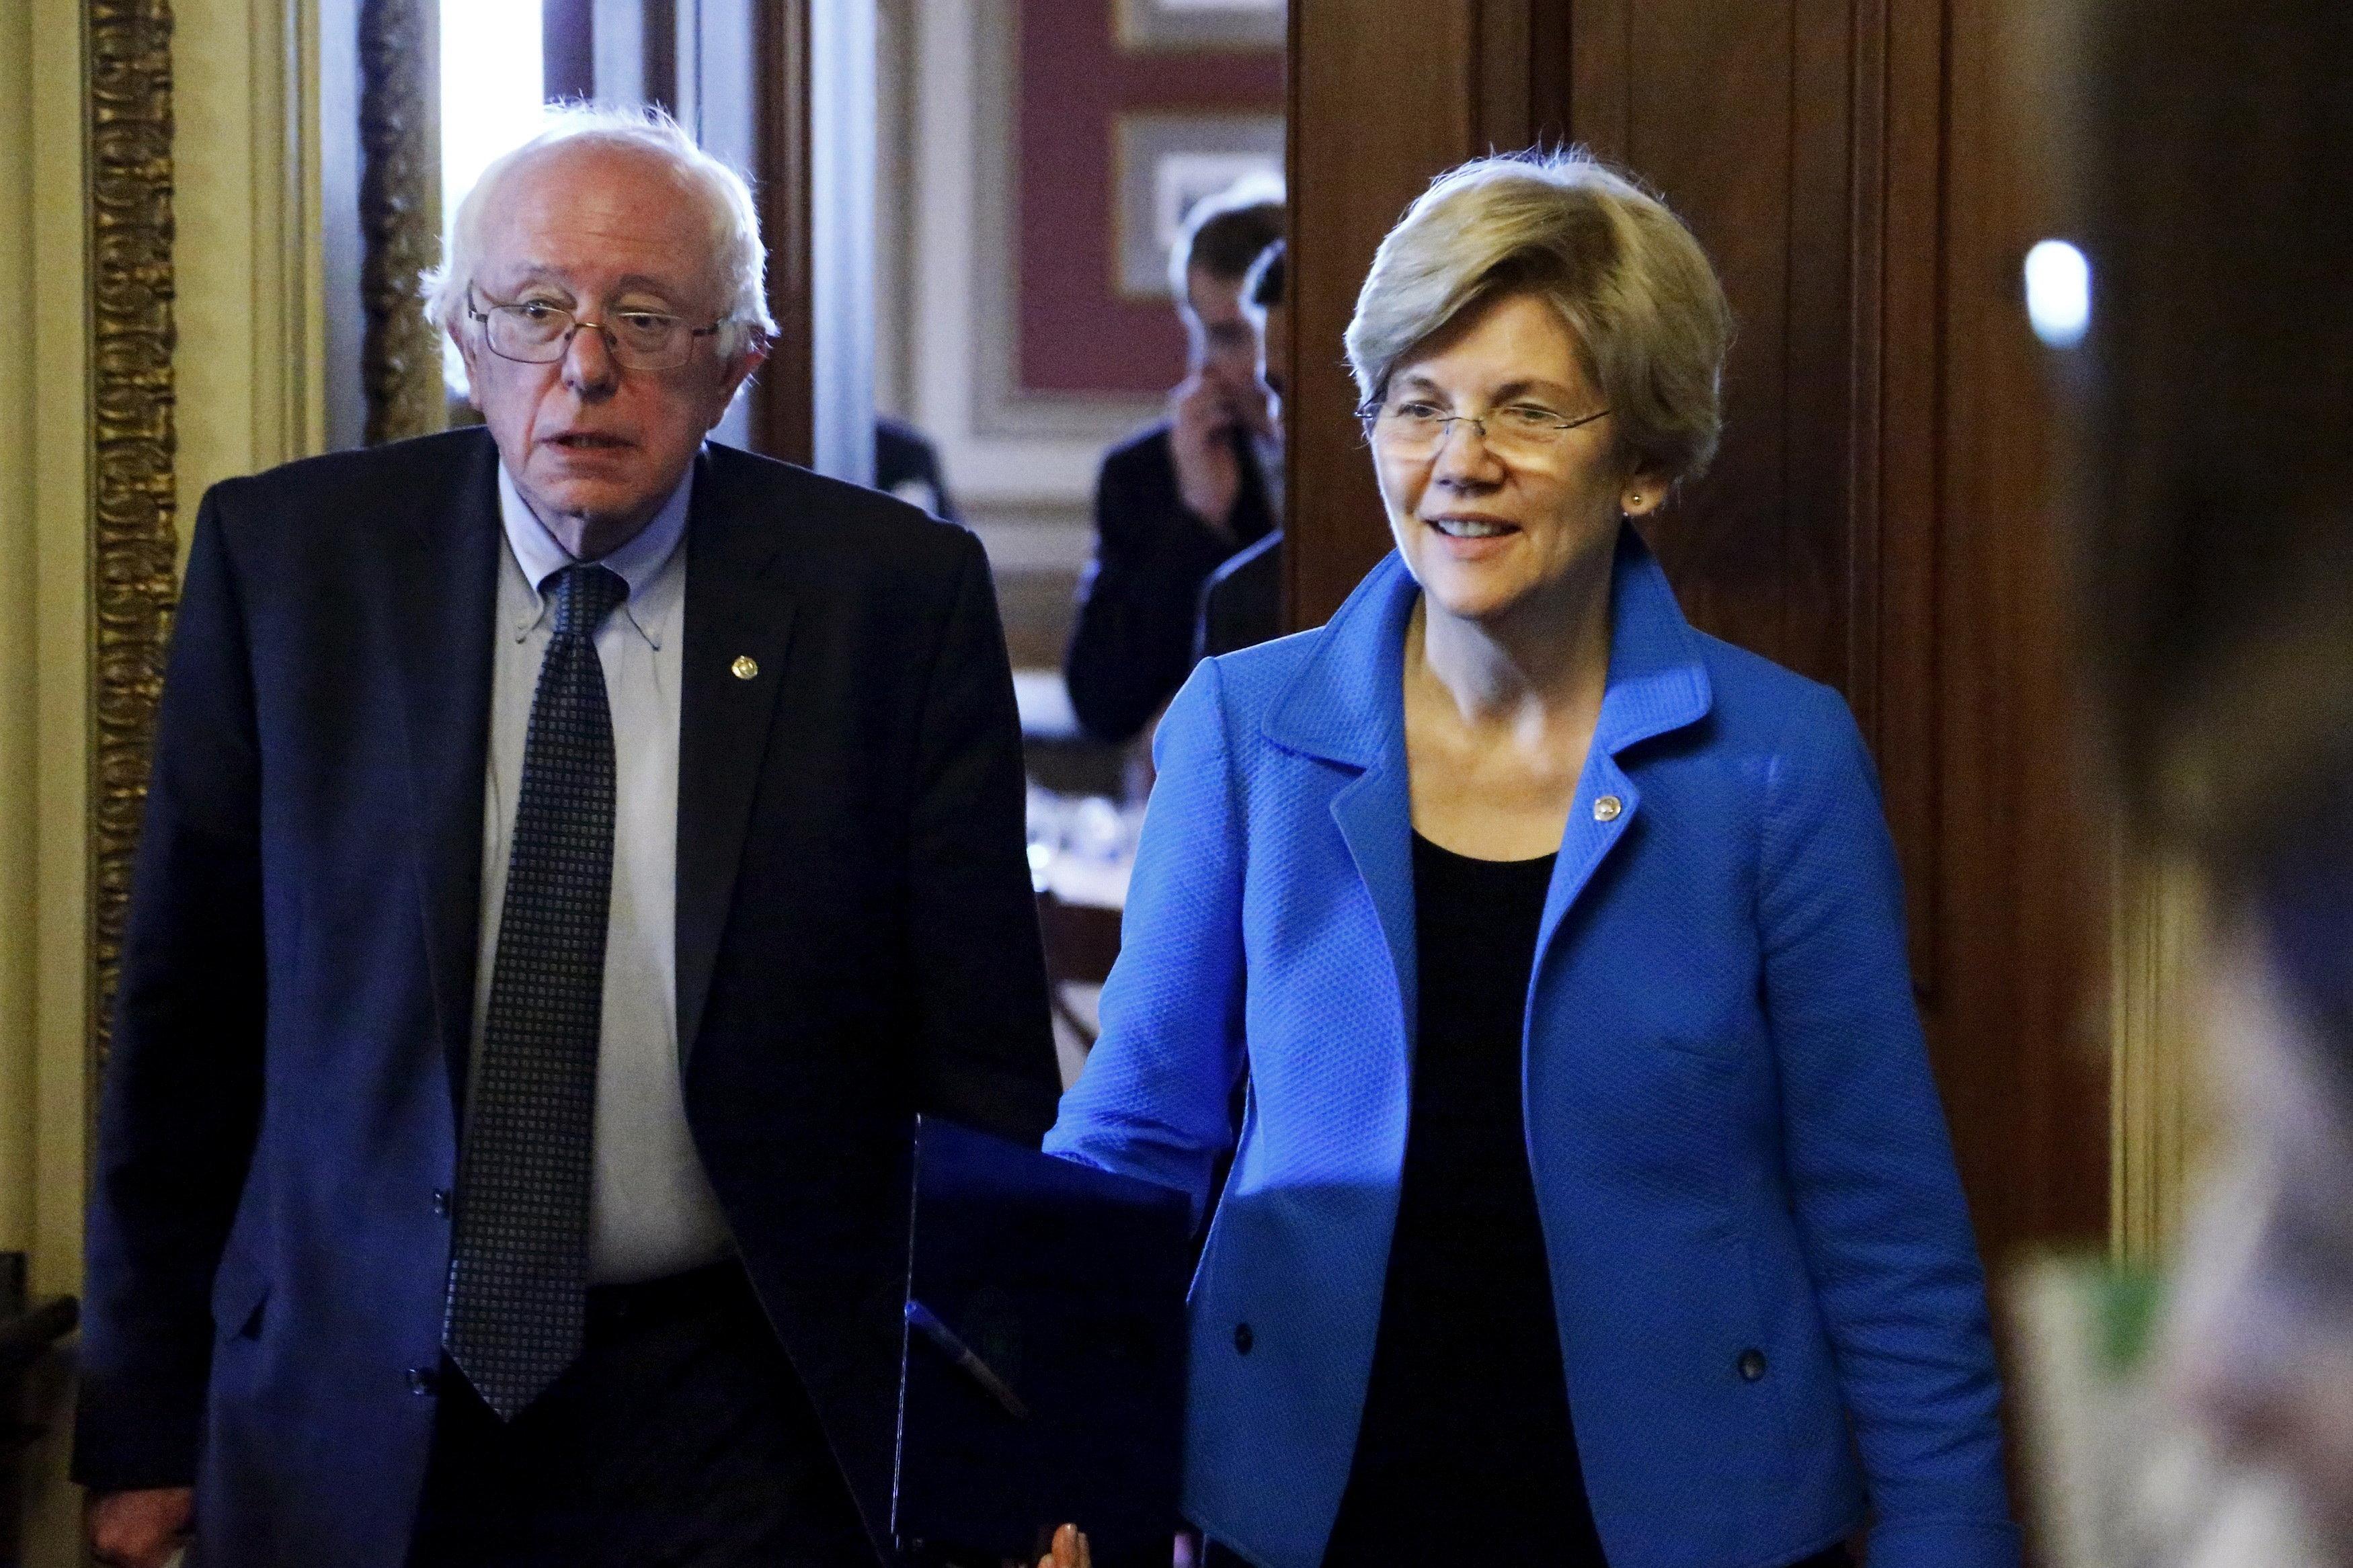 U.S. Senators Bernie Sanders (I-VT) (L) and Elizabeth Warren (D-MA) walk to the Senate floor after the weekly Democratic caucus policy luncheon at the U.S. Capitol in Washington May 12, 2015.  REUTERS/Jonathan Ernst